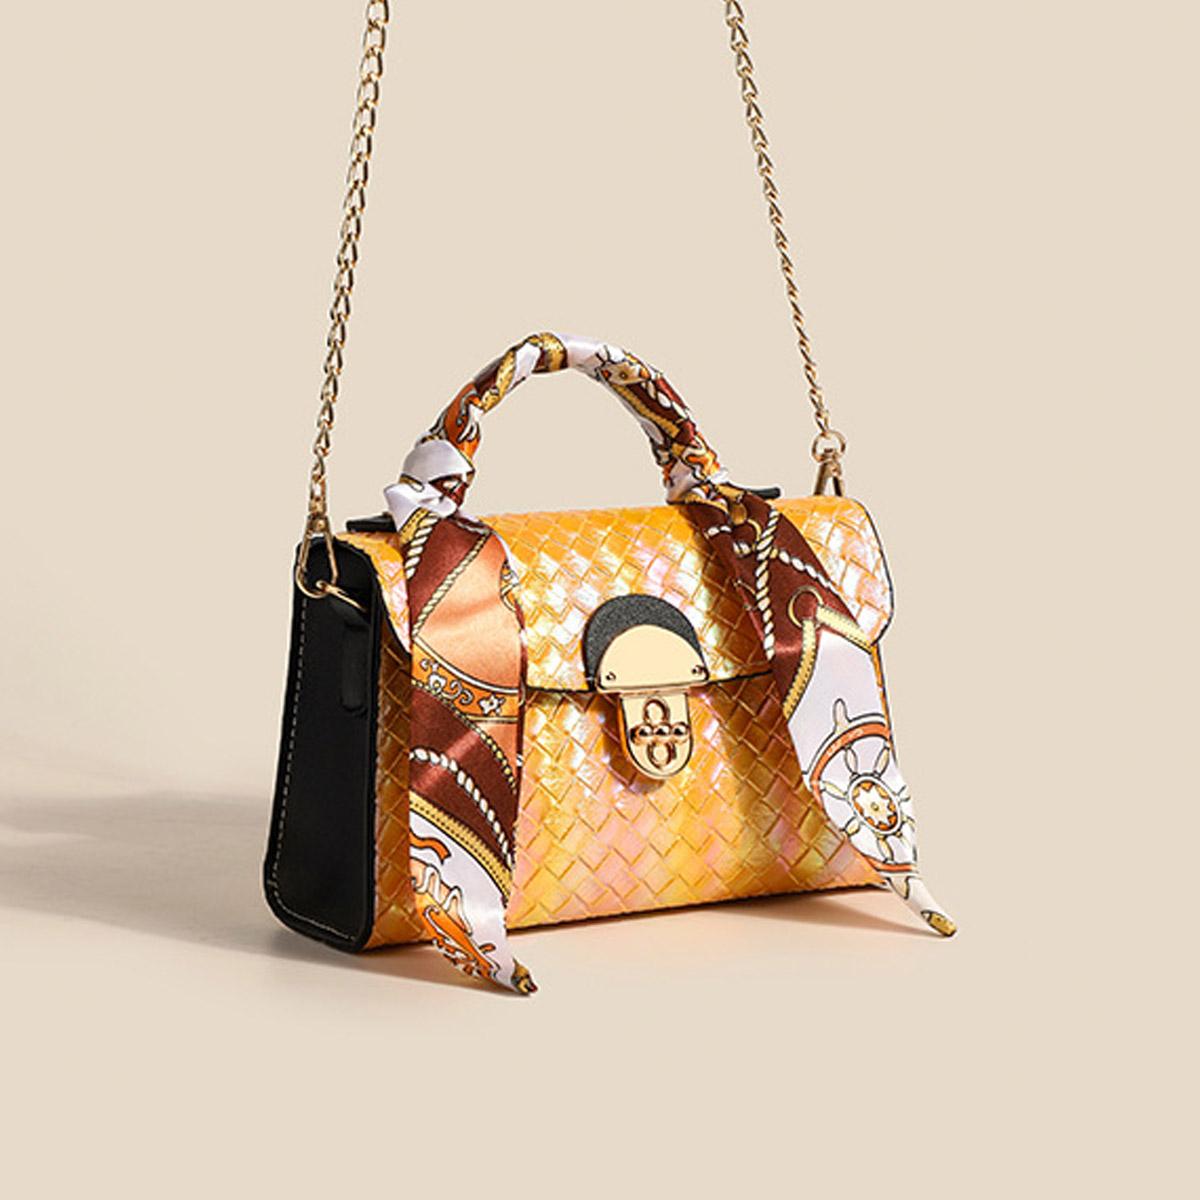 Ribbon Detail PU Gold Chain CrossBody Messenger Bag